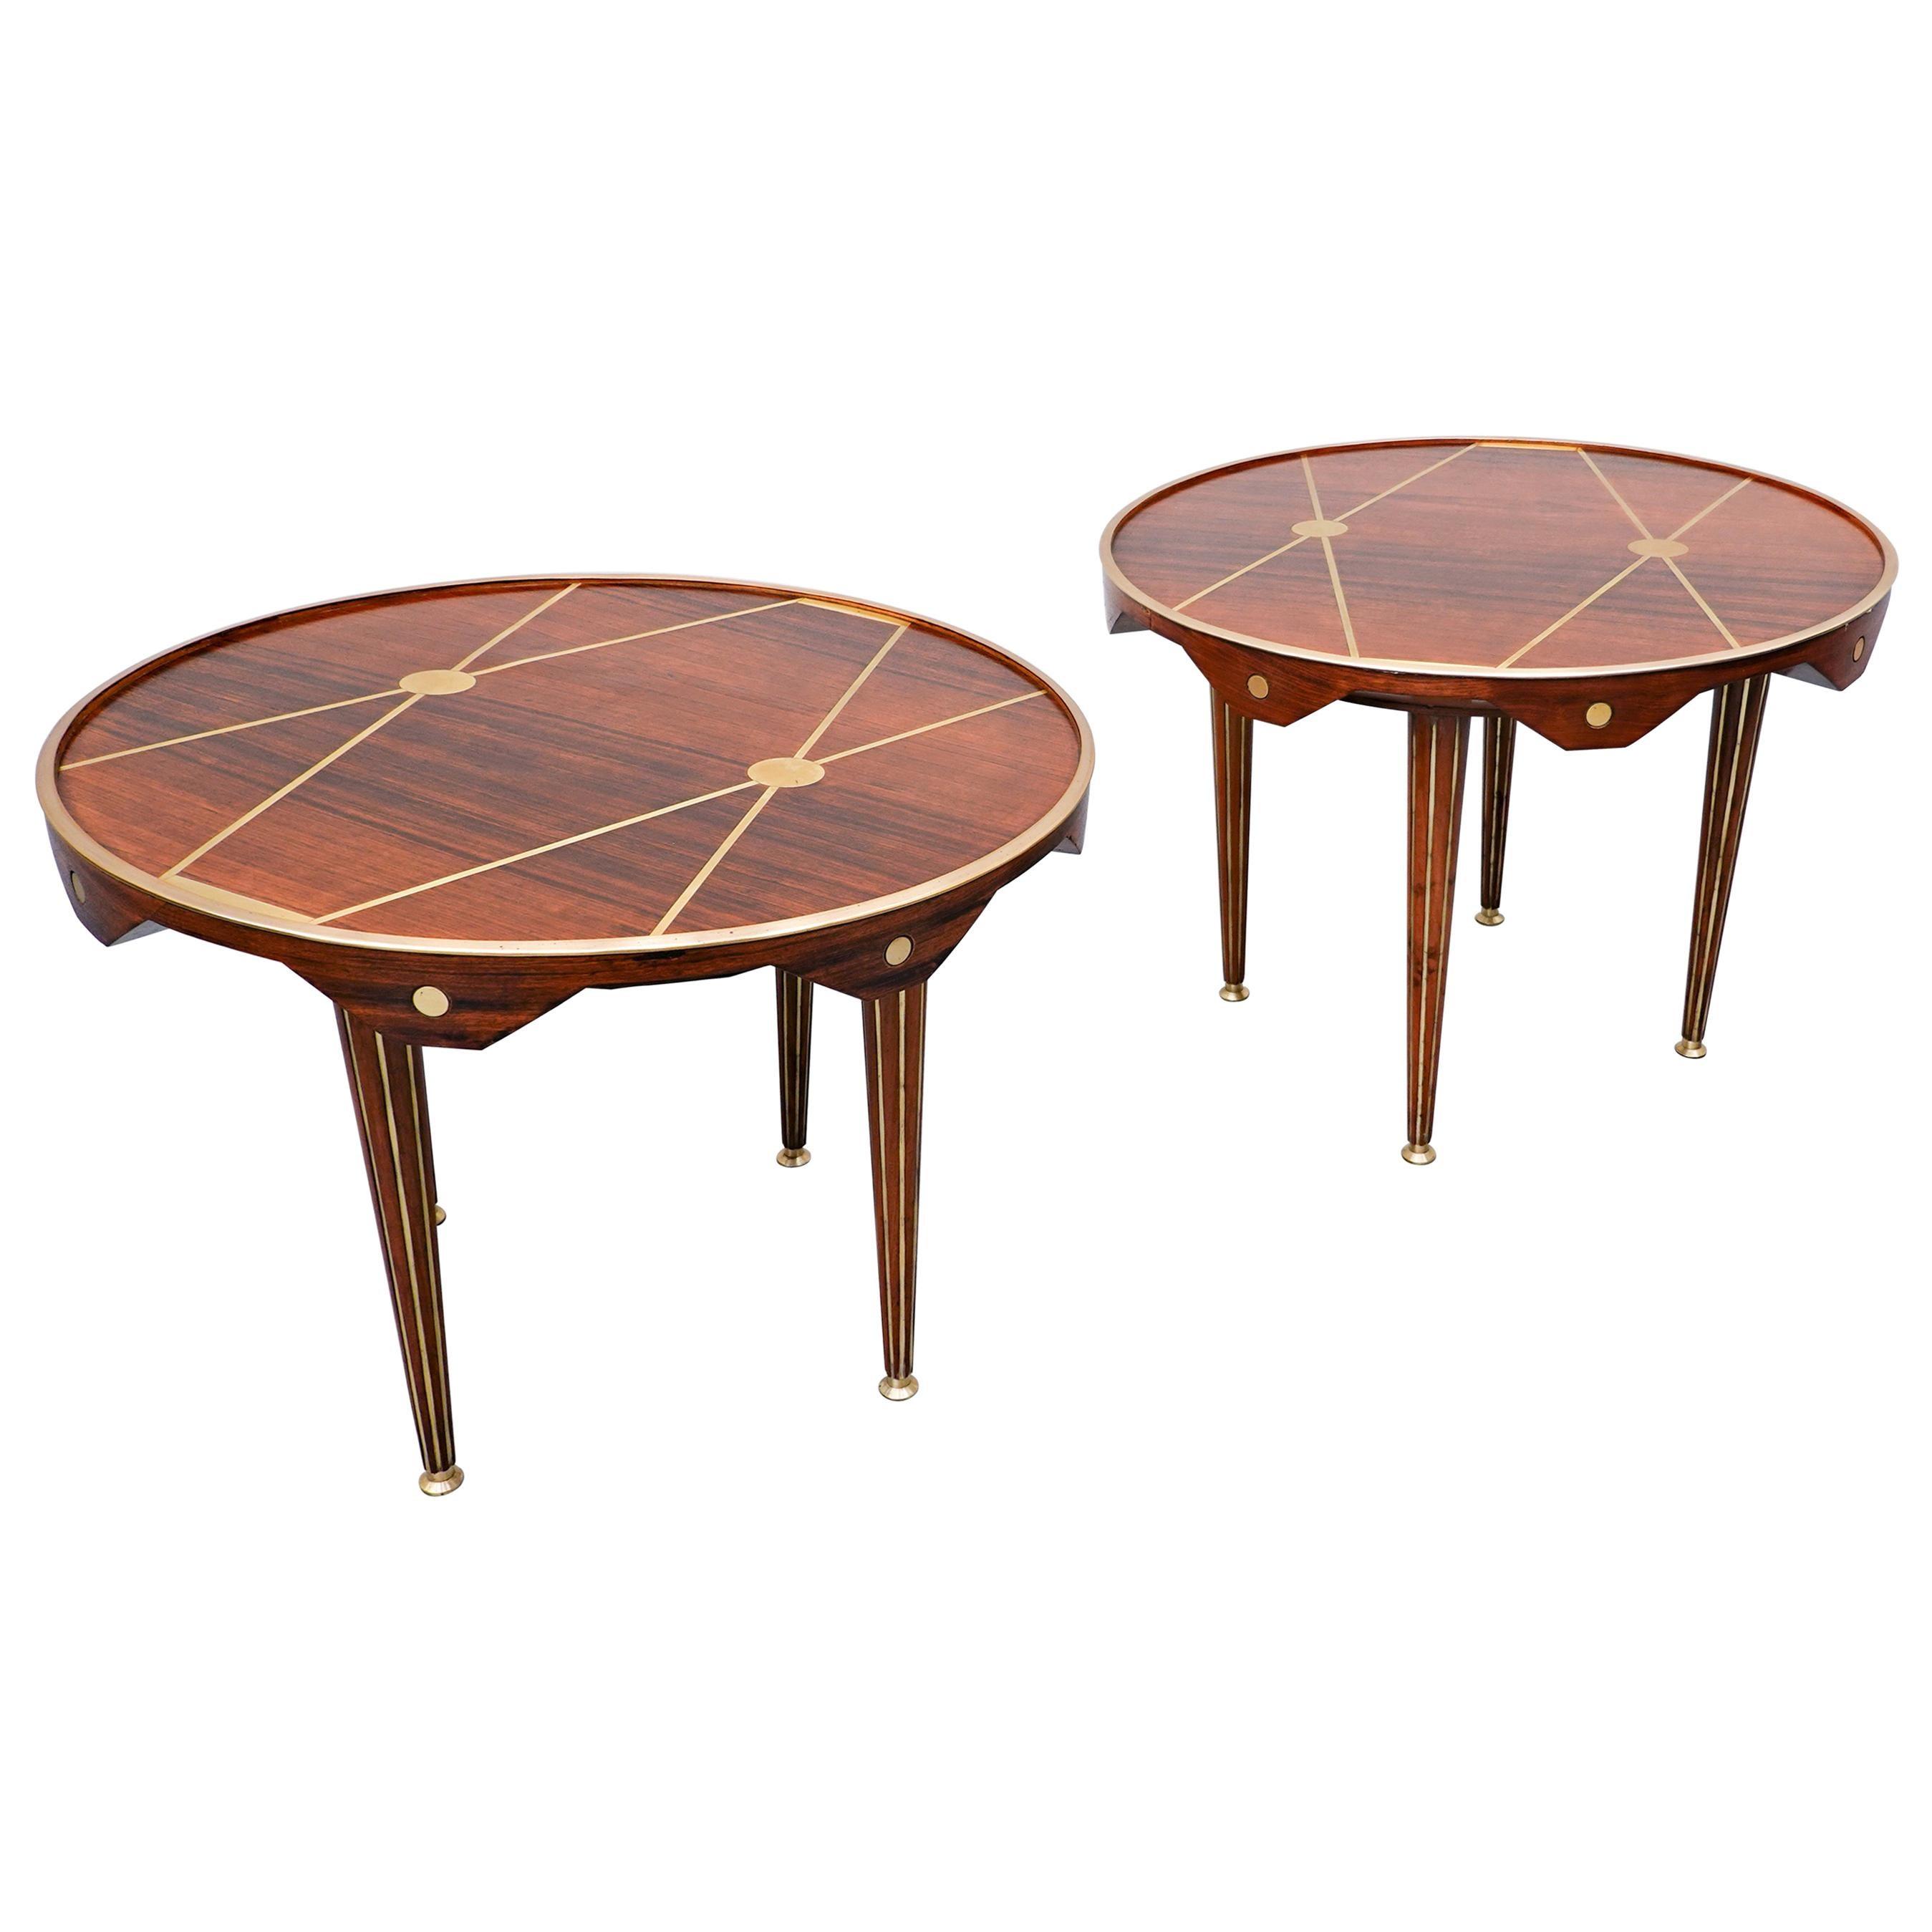 Italian Side Table, Walnut and Brass, 1940s